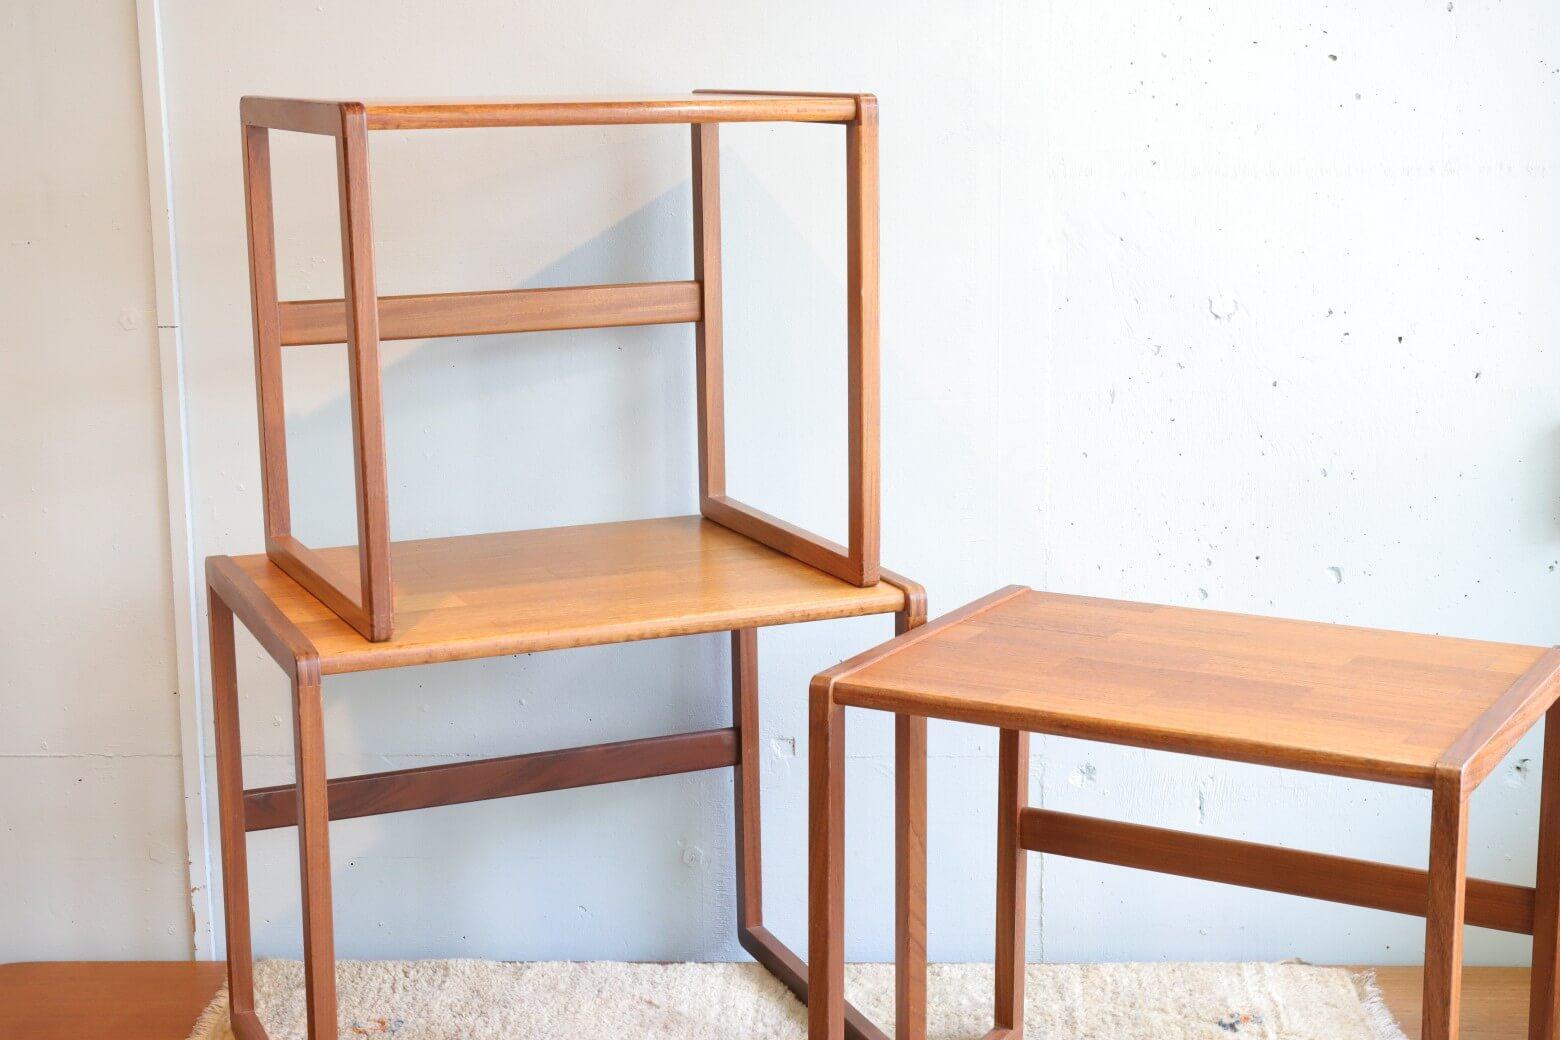 UK vintage G-PLAN Nest Table/イギリス ヴィンテージ G-PLAN ネストテーブル